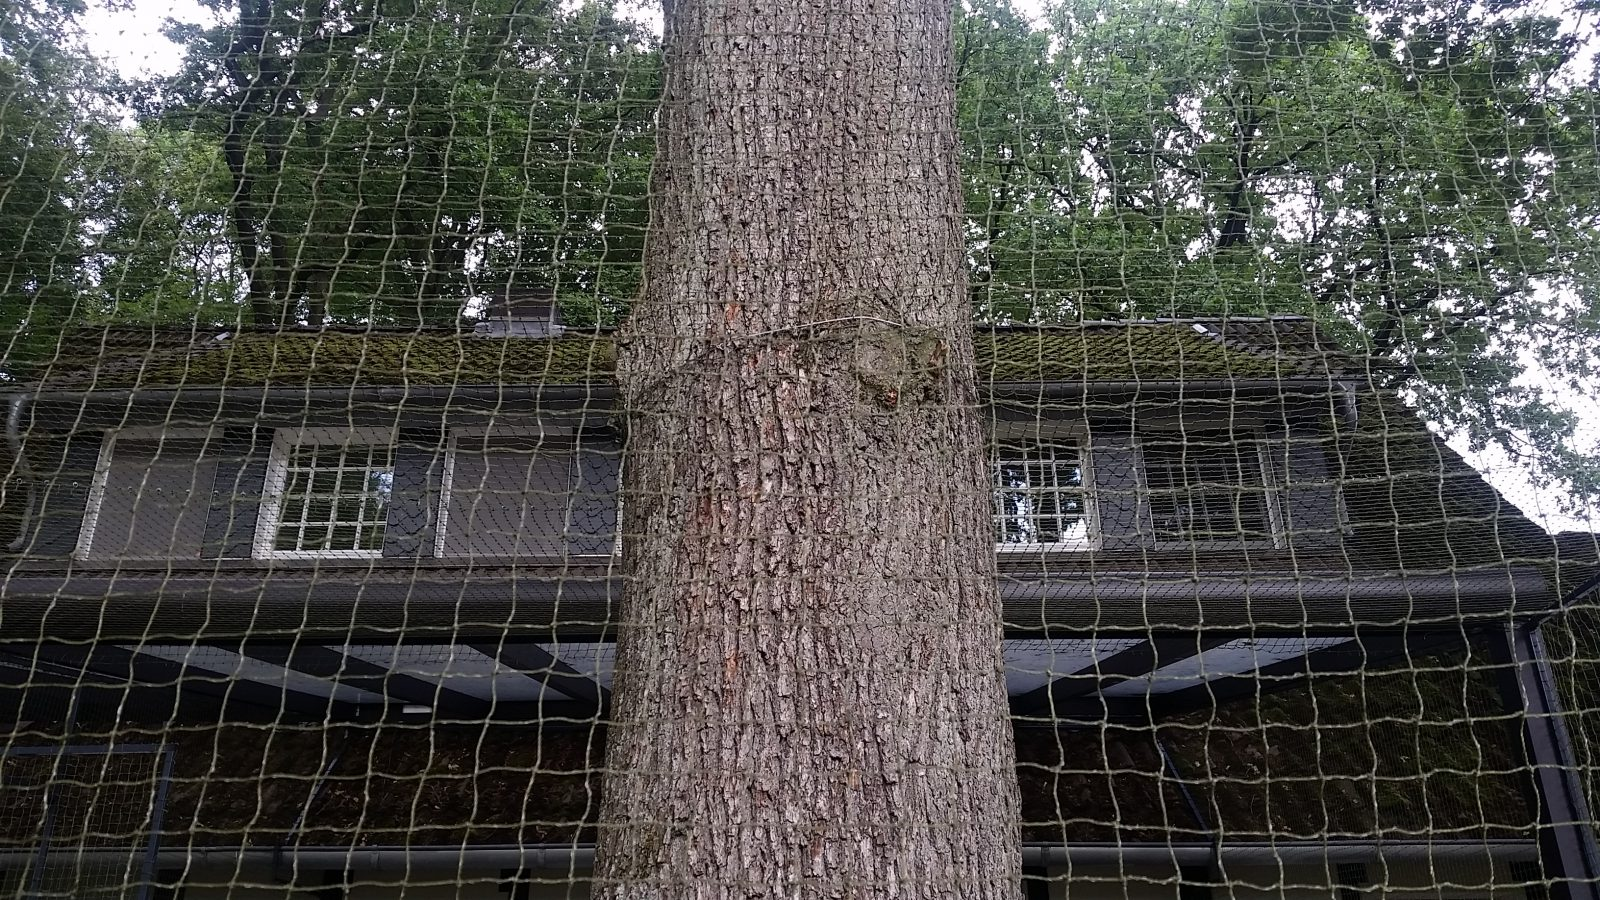 Katzennetz trotz Baum